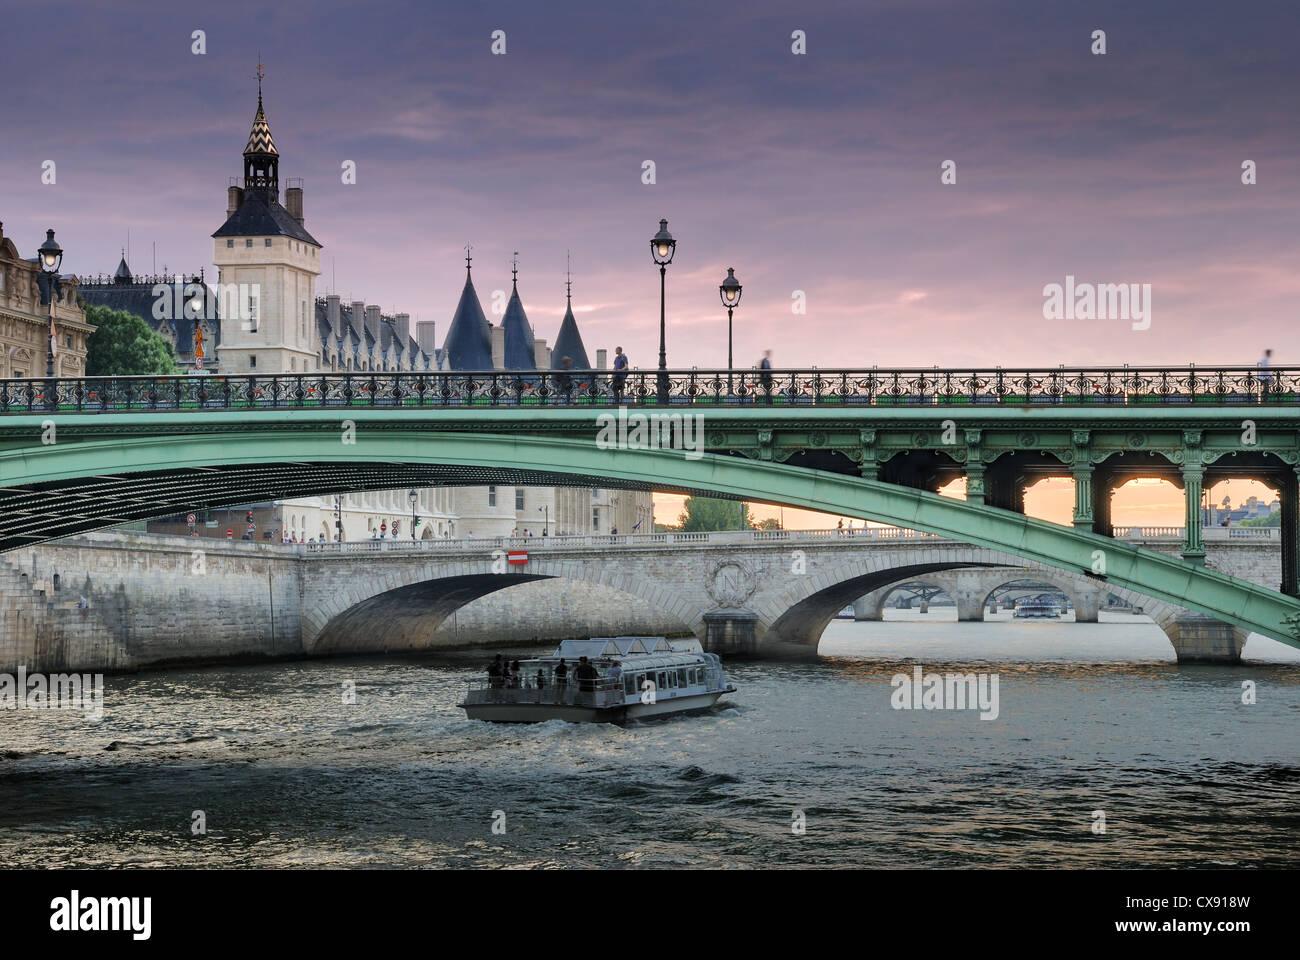 The bridge Pont Notre-Dame over river Seine in Paris, France. - Stock Image